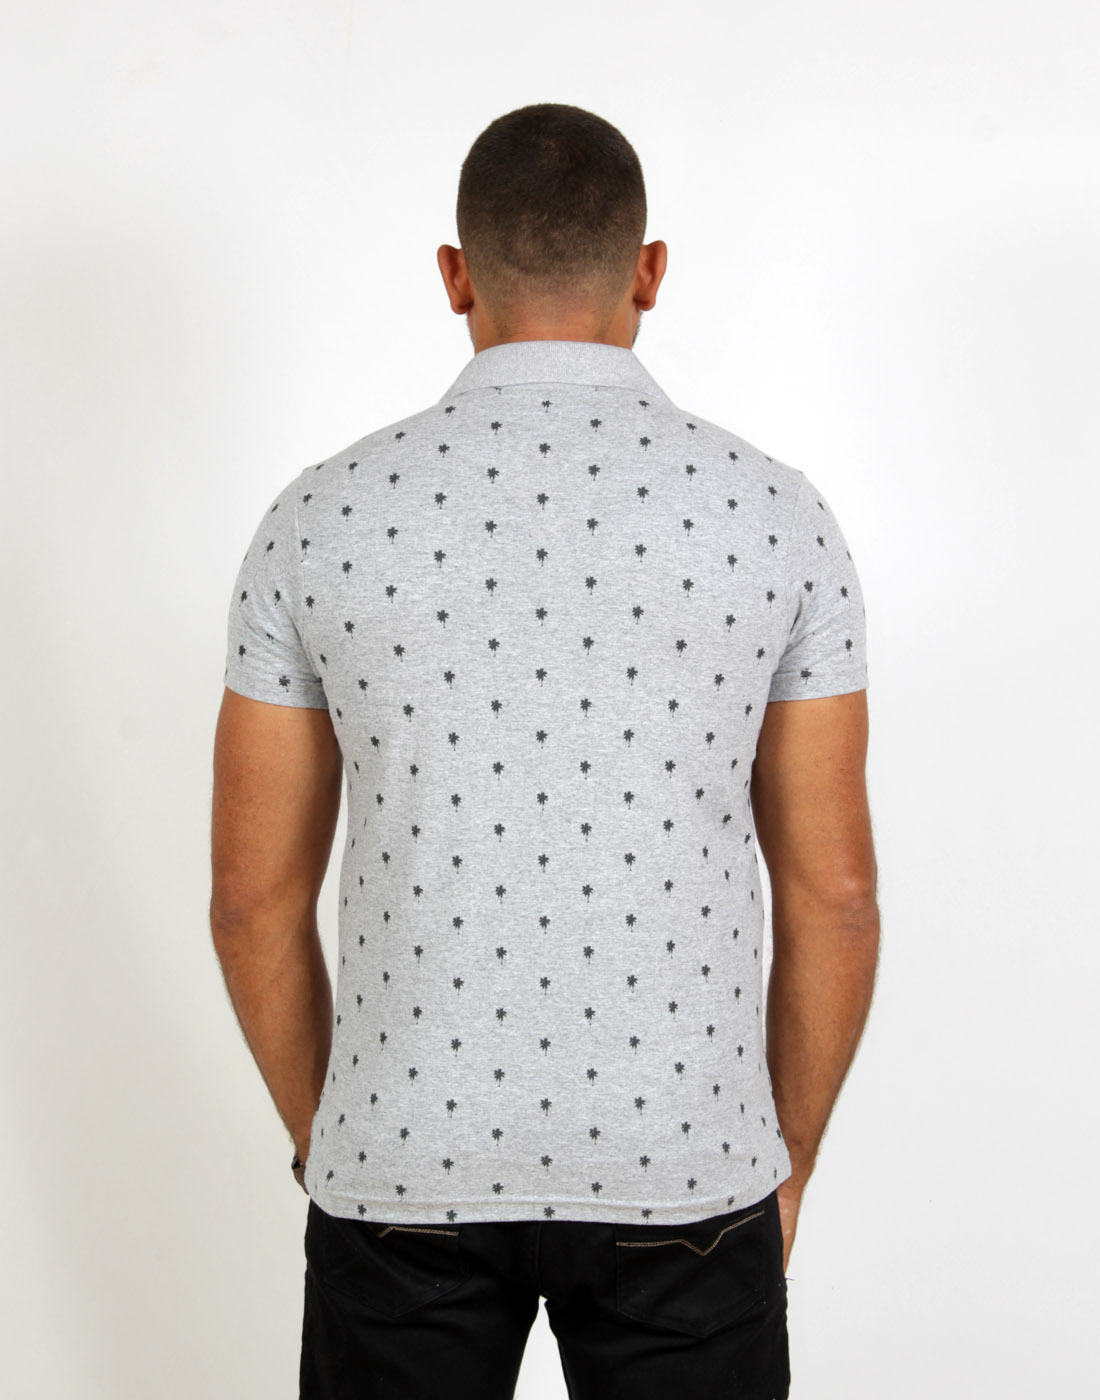 Camiseta Polo Masc. Especial Estampada Mescla Fatal